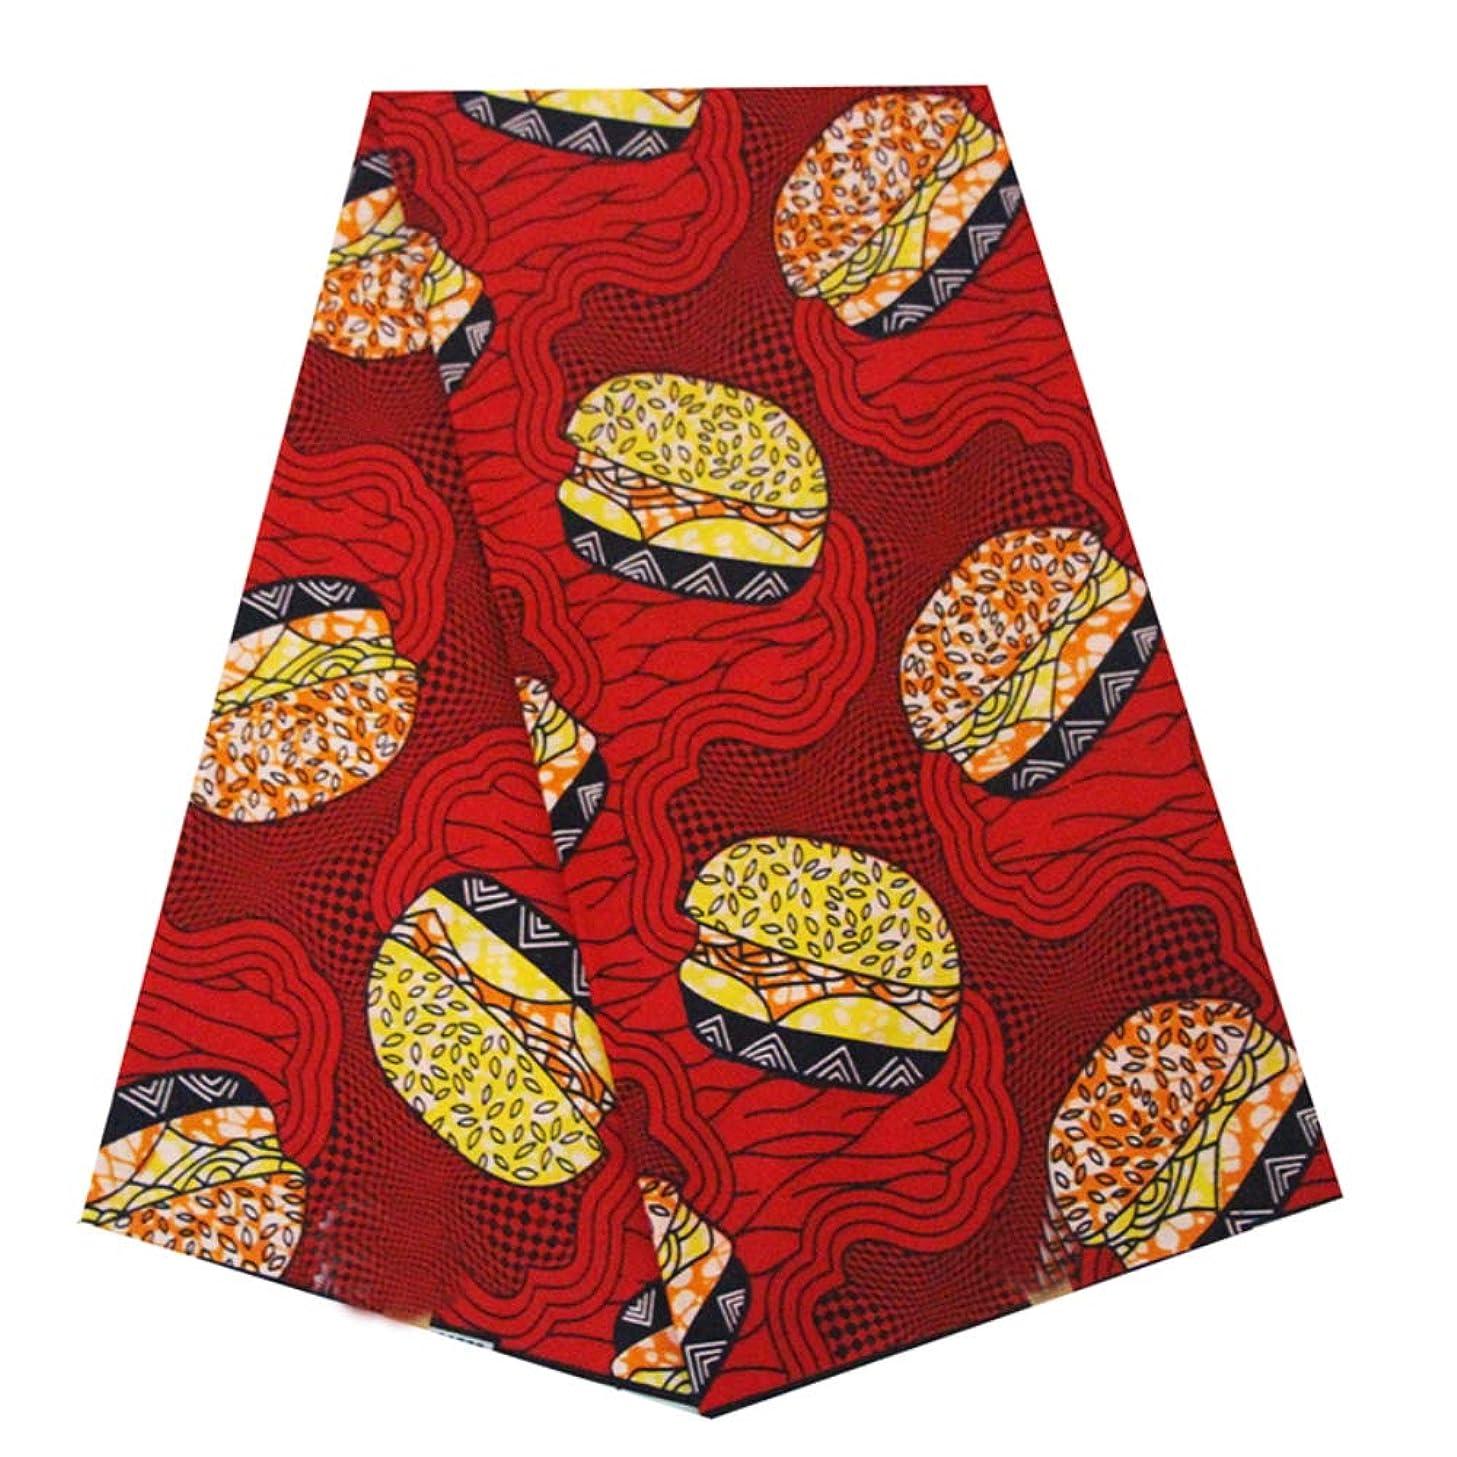 pqdaysun African Super Wax Print Fabric Ankara Fabric Wax Material 6 Yards for Sewing Dress Clothing (Wine)